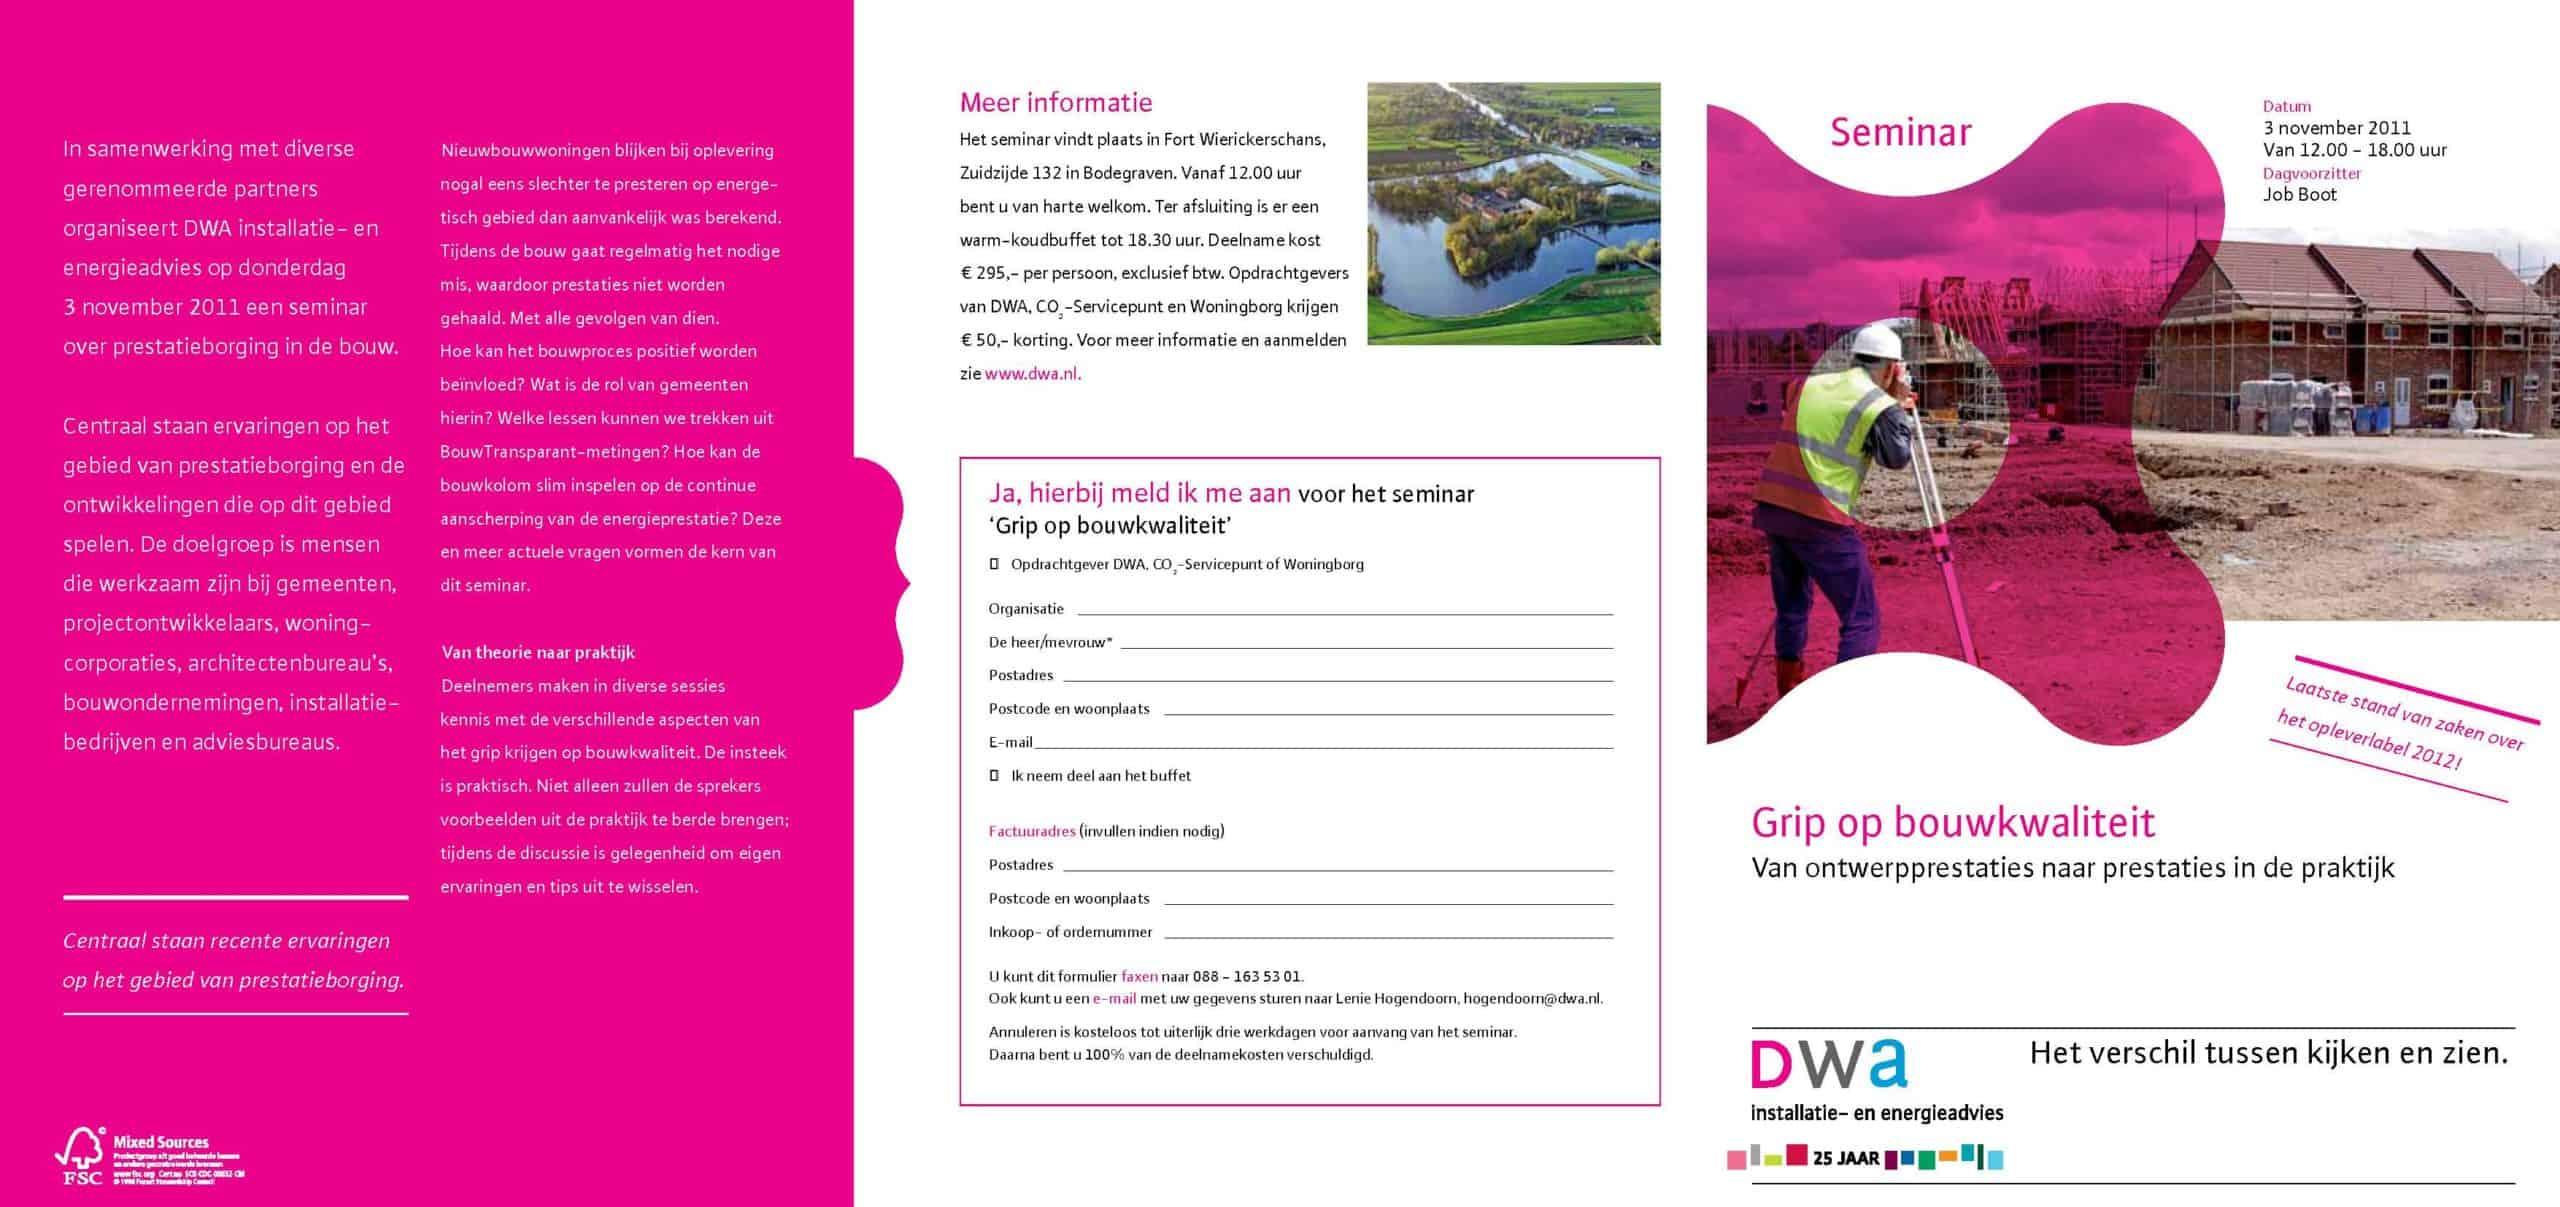 Flyer-seminar-Grip-op-bouwkwaliteit-web_1-1-scaled